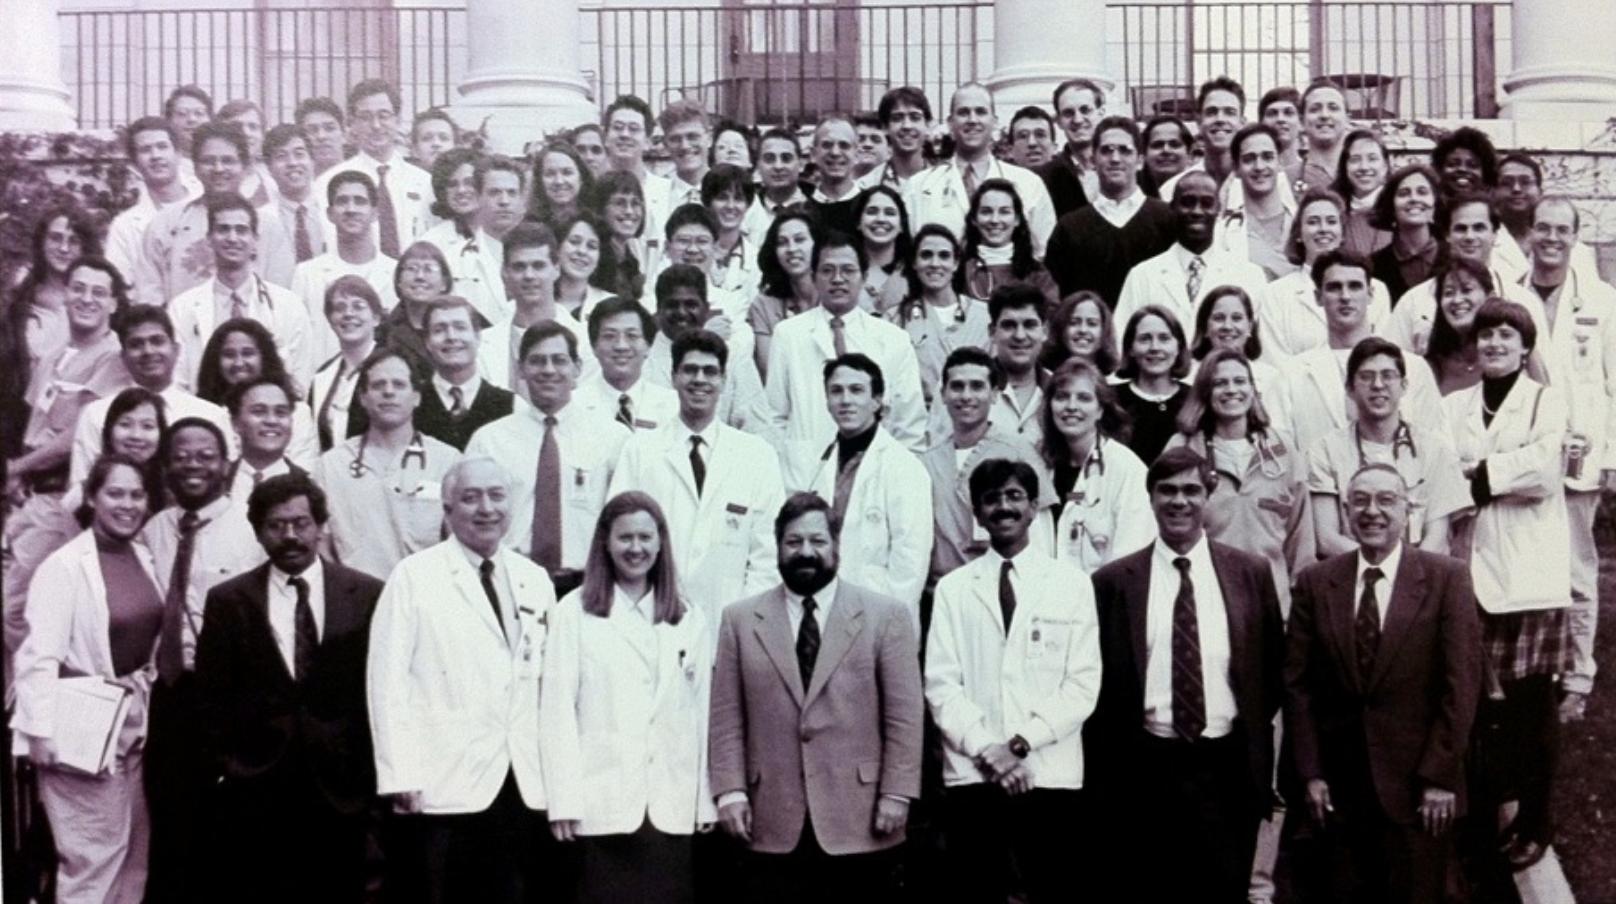 Daniel Kraft and fellow Internal Medicine residents at the Massachusetts General Hospital